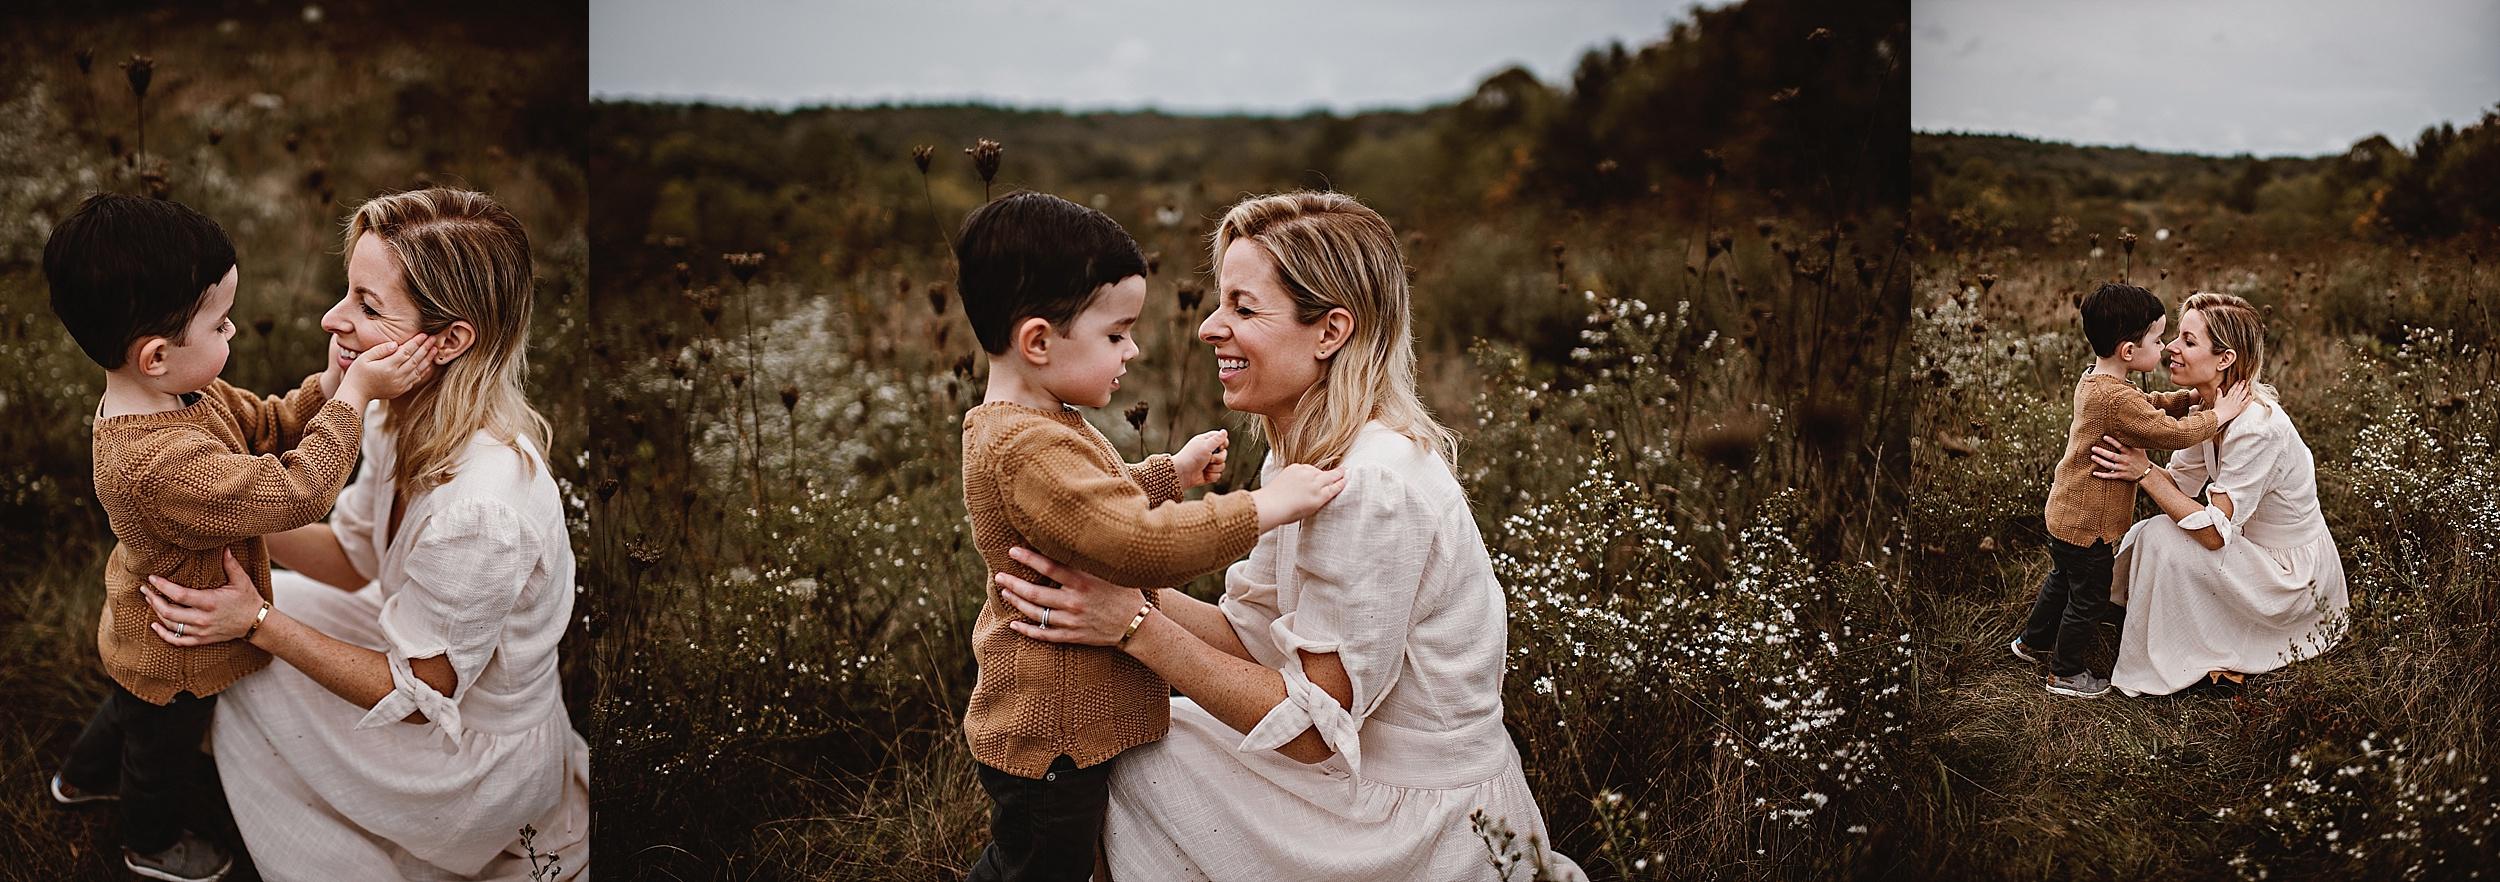 lauren-grayson-photography-portrait-artist-akron-cleveland-ohio-photographer-family-session-fields-sunset-fall_0193.jpg